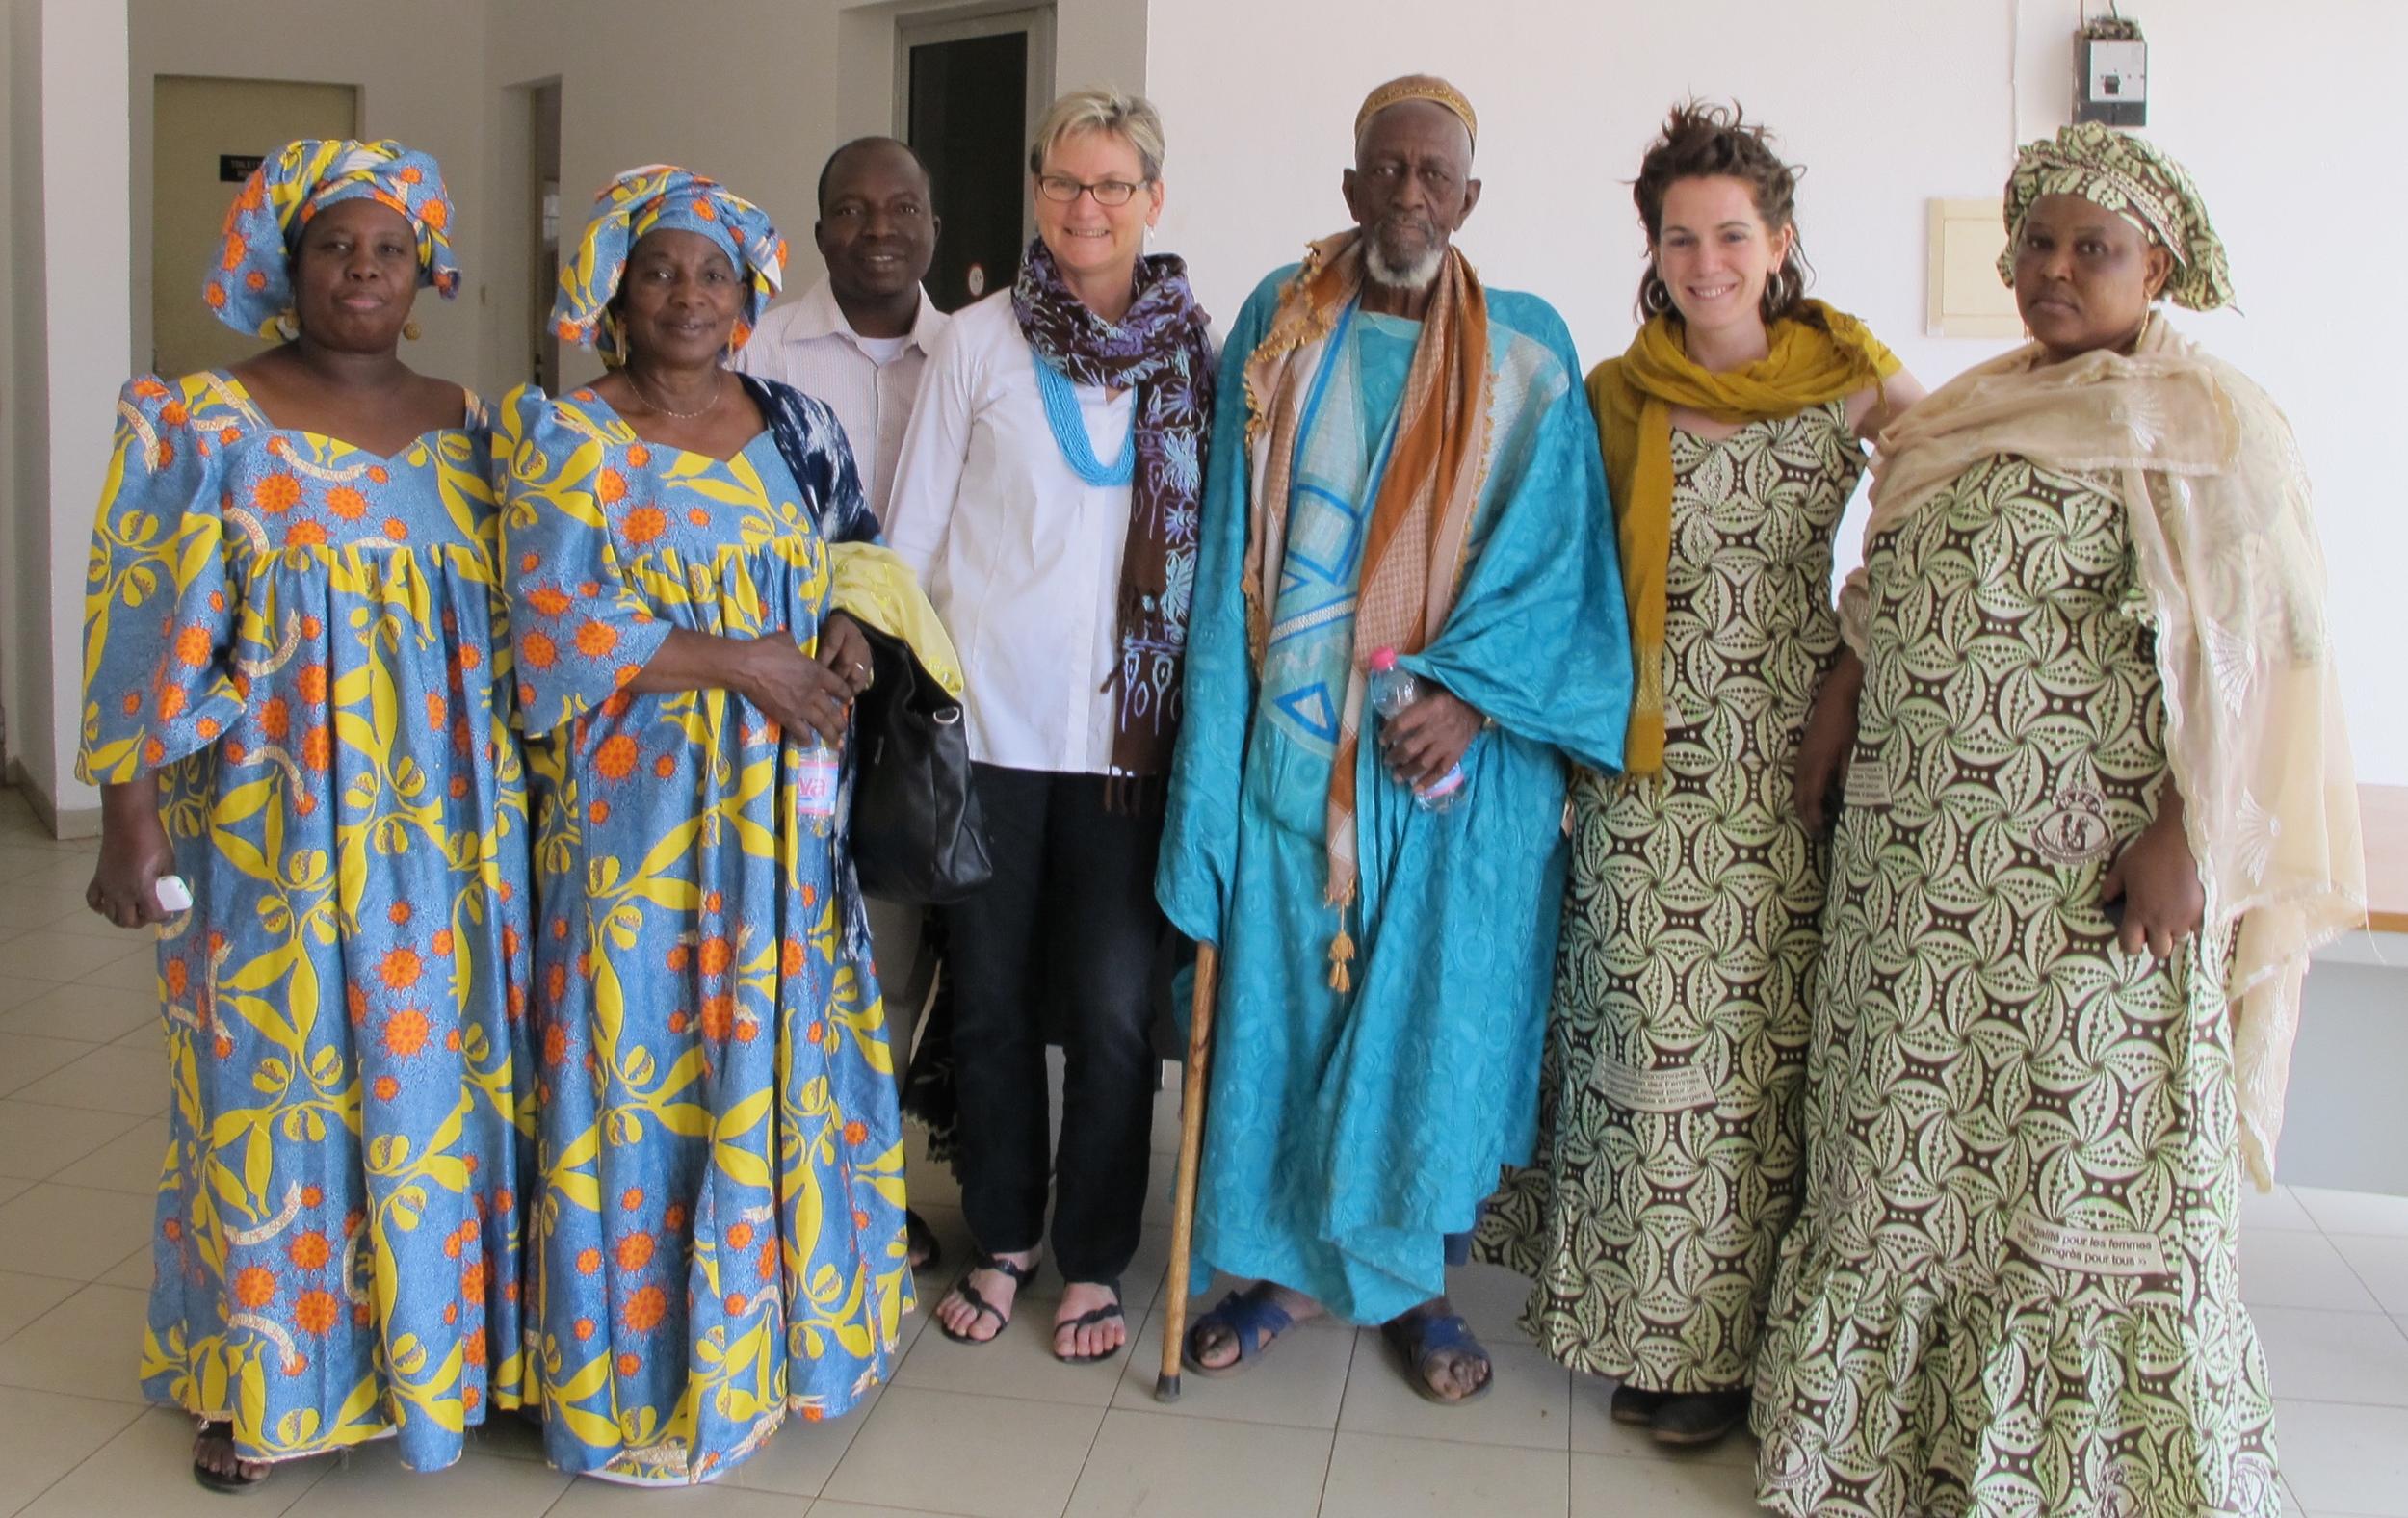 MmeBadiallo, Mme Rokia (Peer educators), M Guidé (Clinic president), Annie De Groot, M Diarra (Sikoro Village Chief), Eliza Squibb, Mme Diaby (Peer educator)